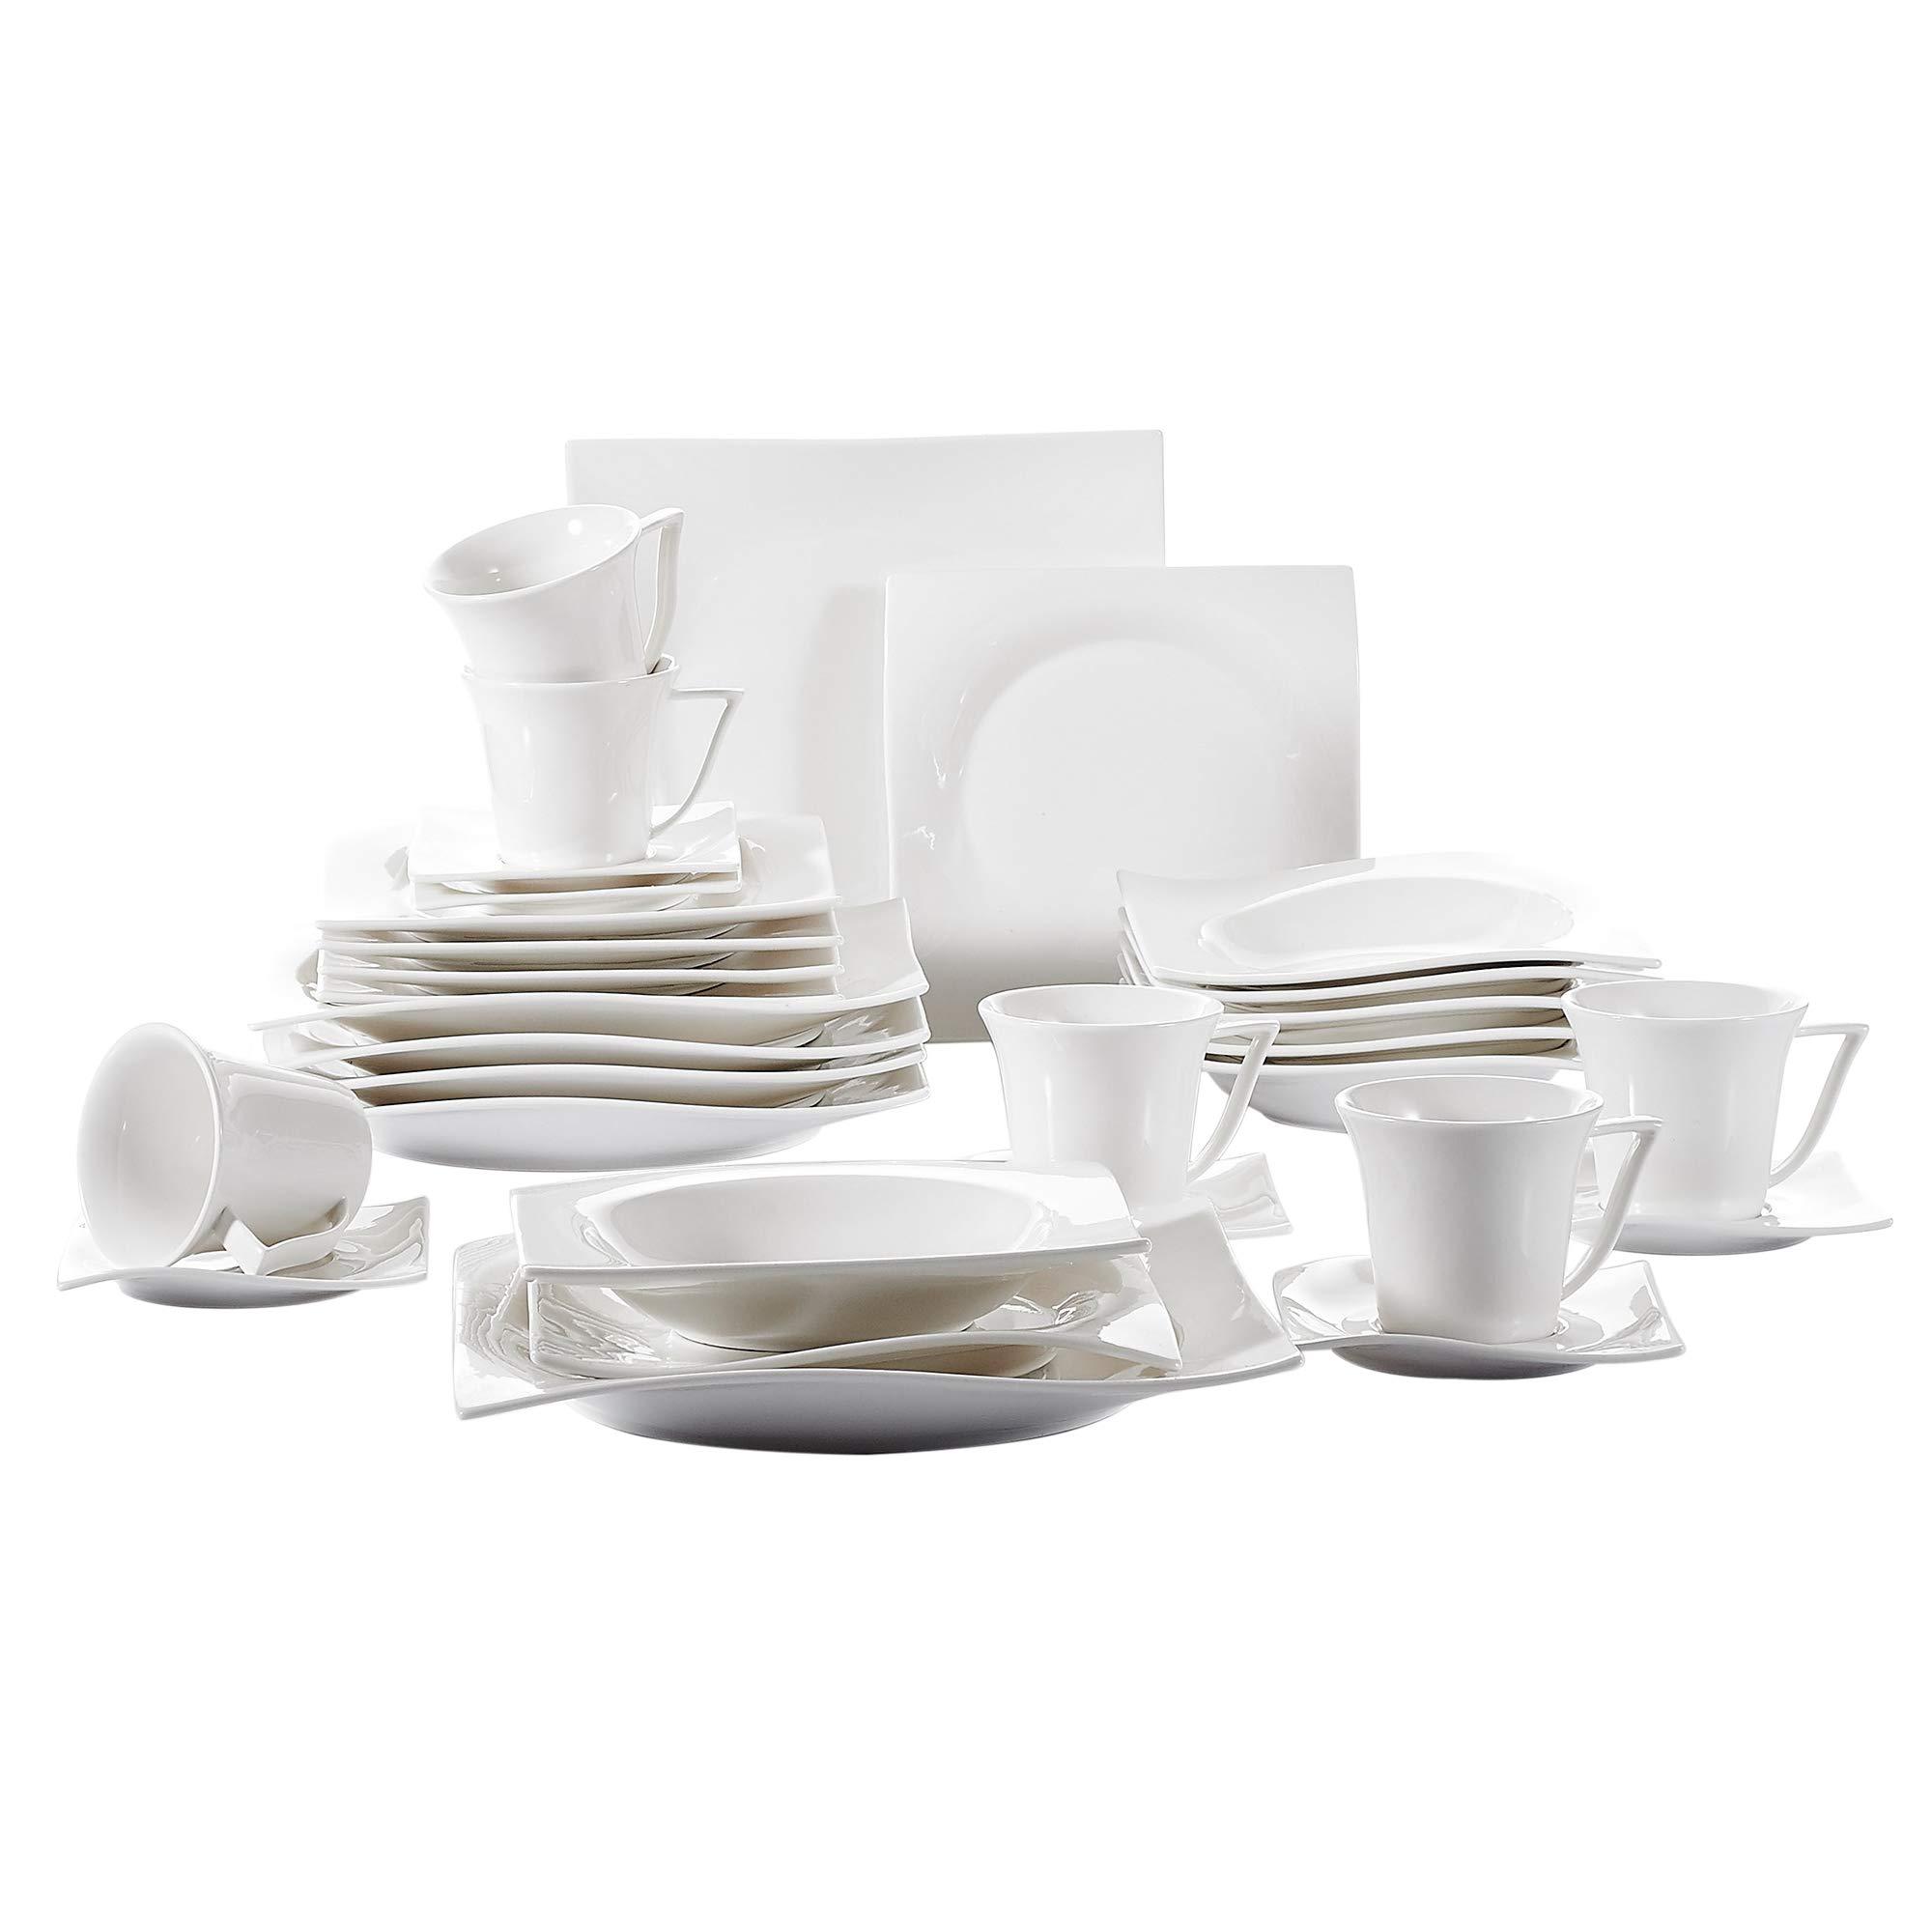 Vancasso Porcelain Dinnerware Set of 6, Cream White Glazed Cups Saucers Plates Dinner Service Set for Dessert Soup Catering, 30-Pieces